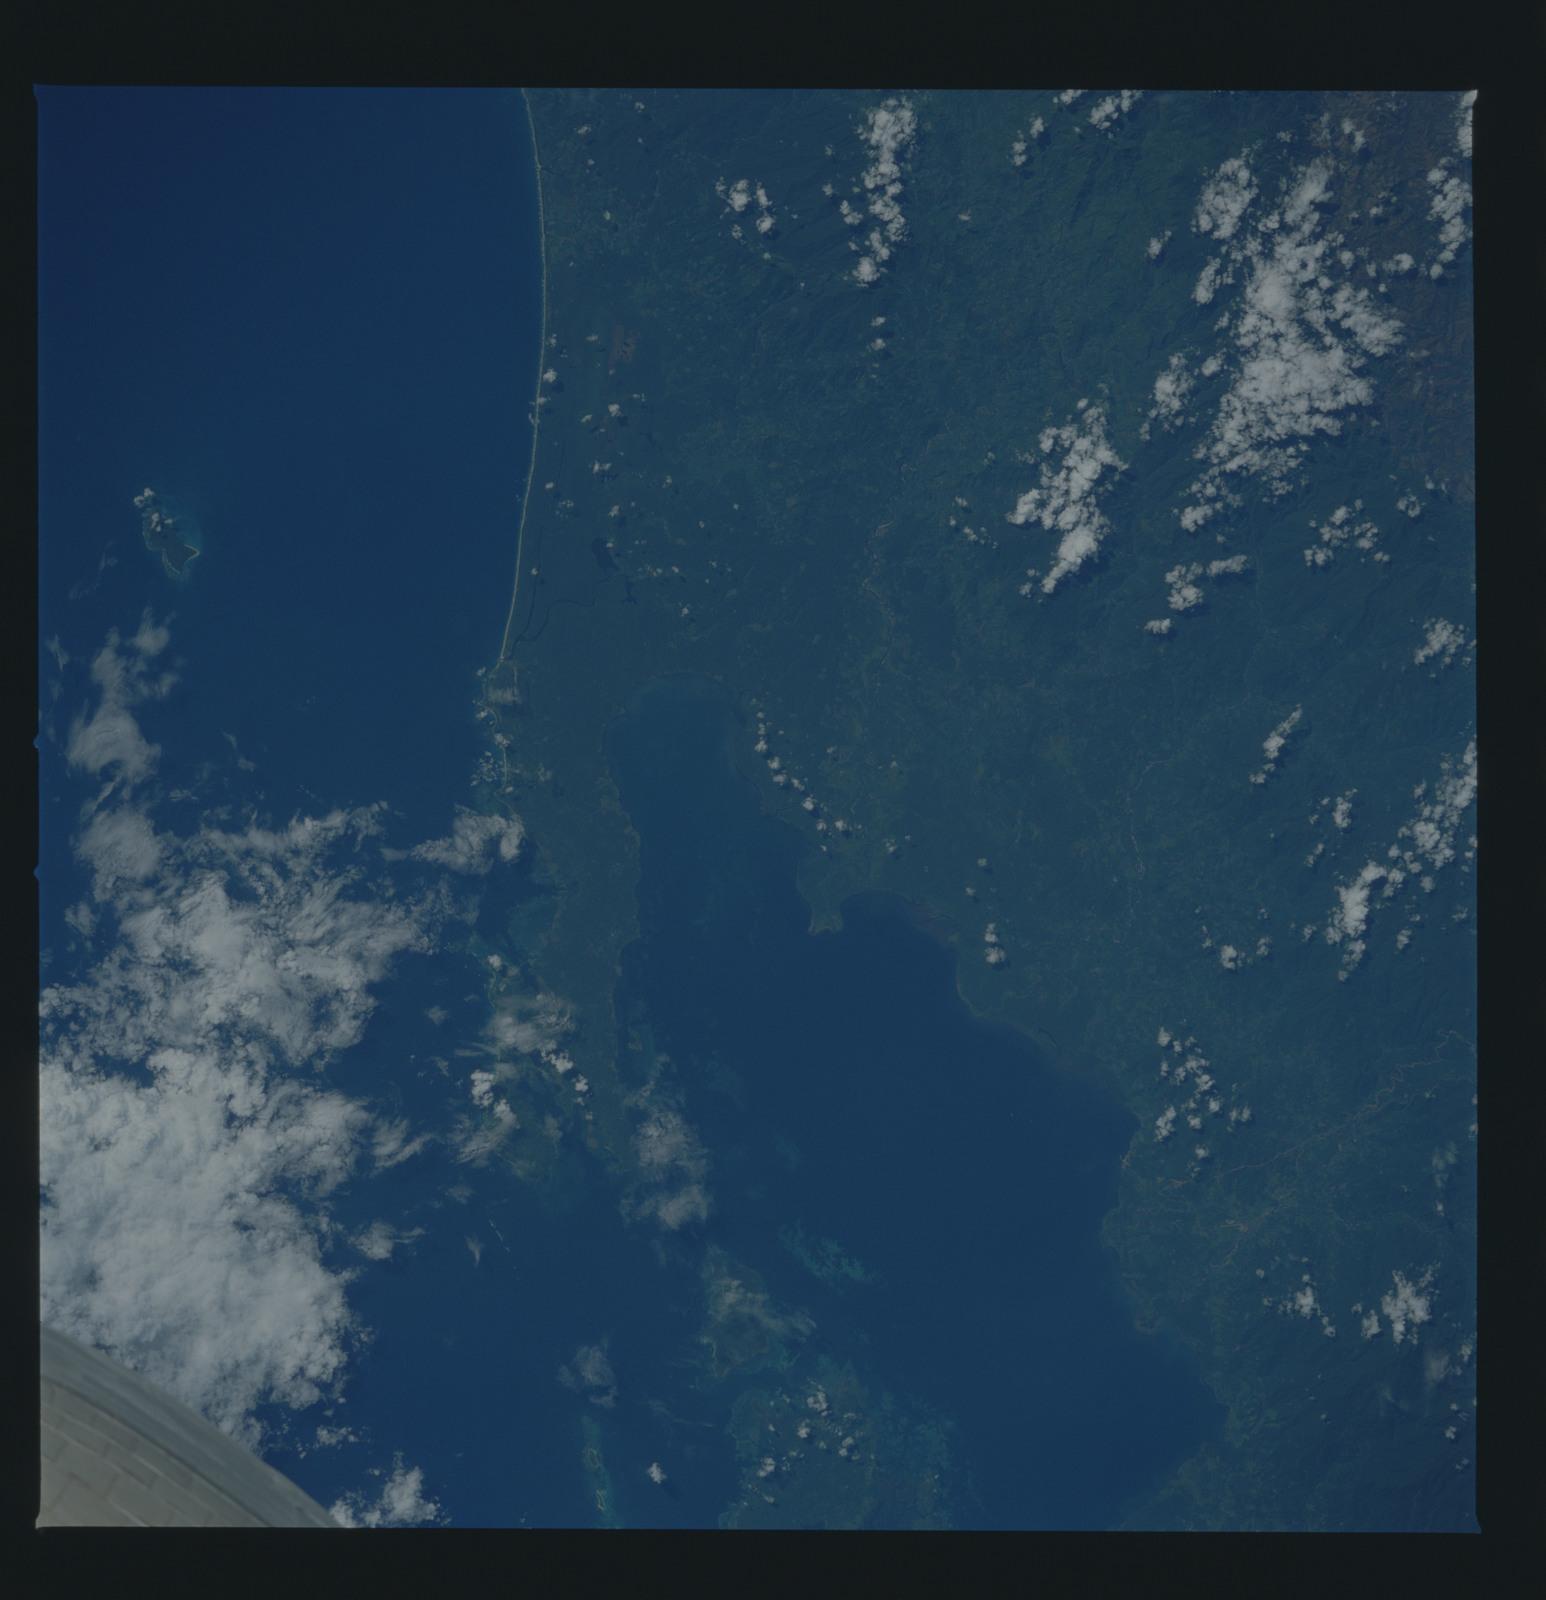 51B-34-051 - STS-51B - 51B earth observation